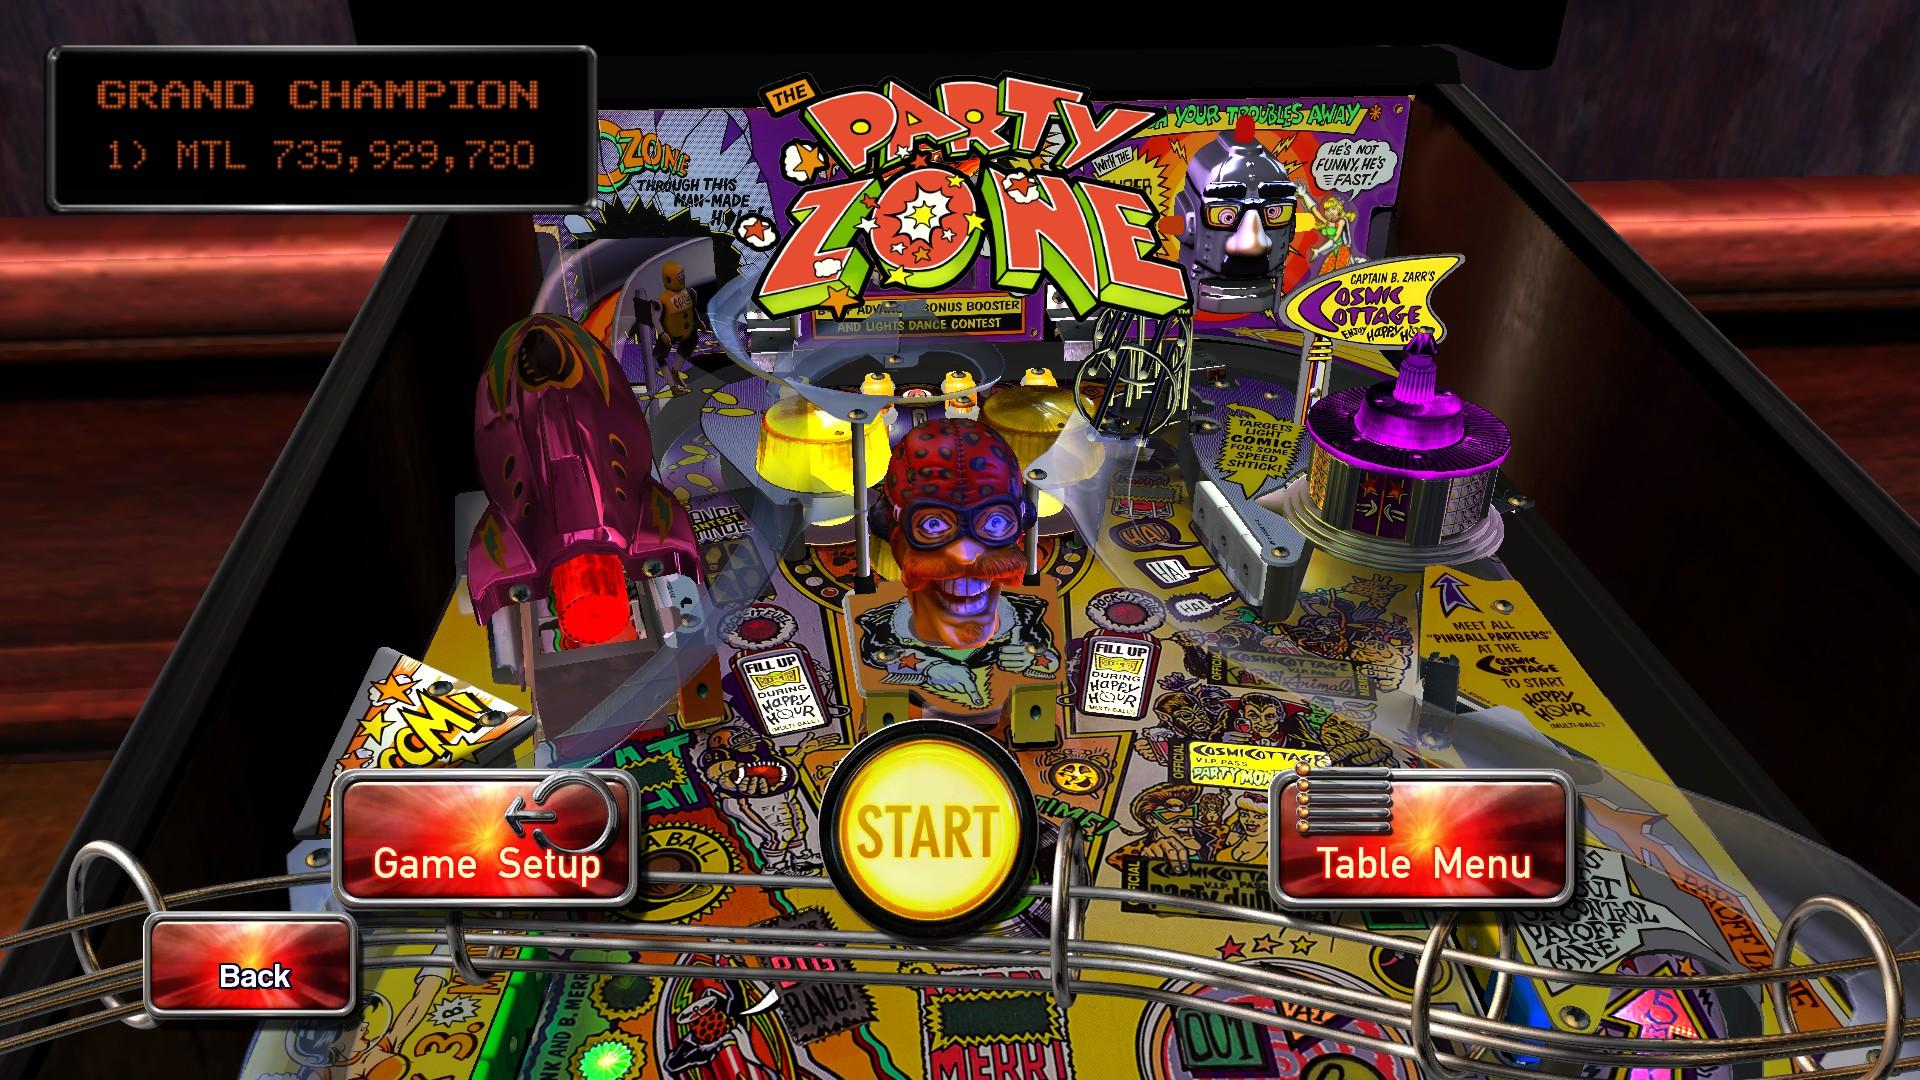 Mantalow: Pinball Arcade: Party Zone (PC) 735,929,780 points on 2016-05-17 11:41:38